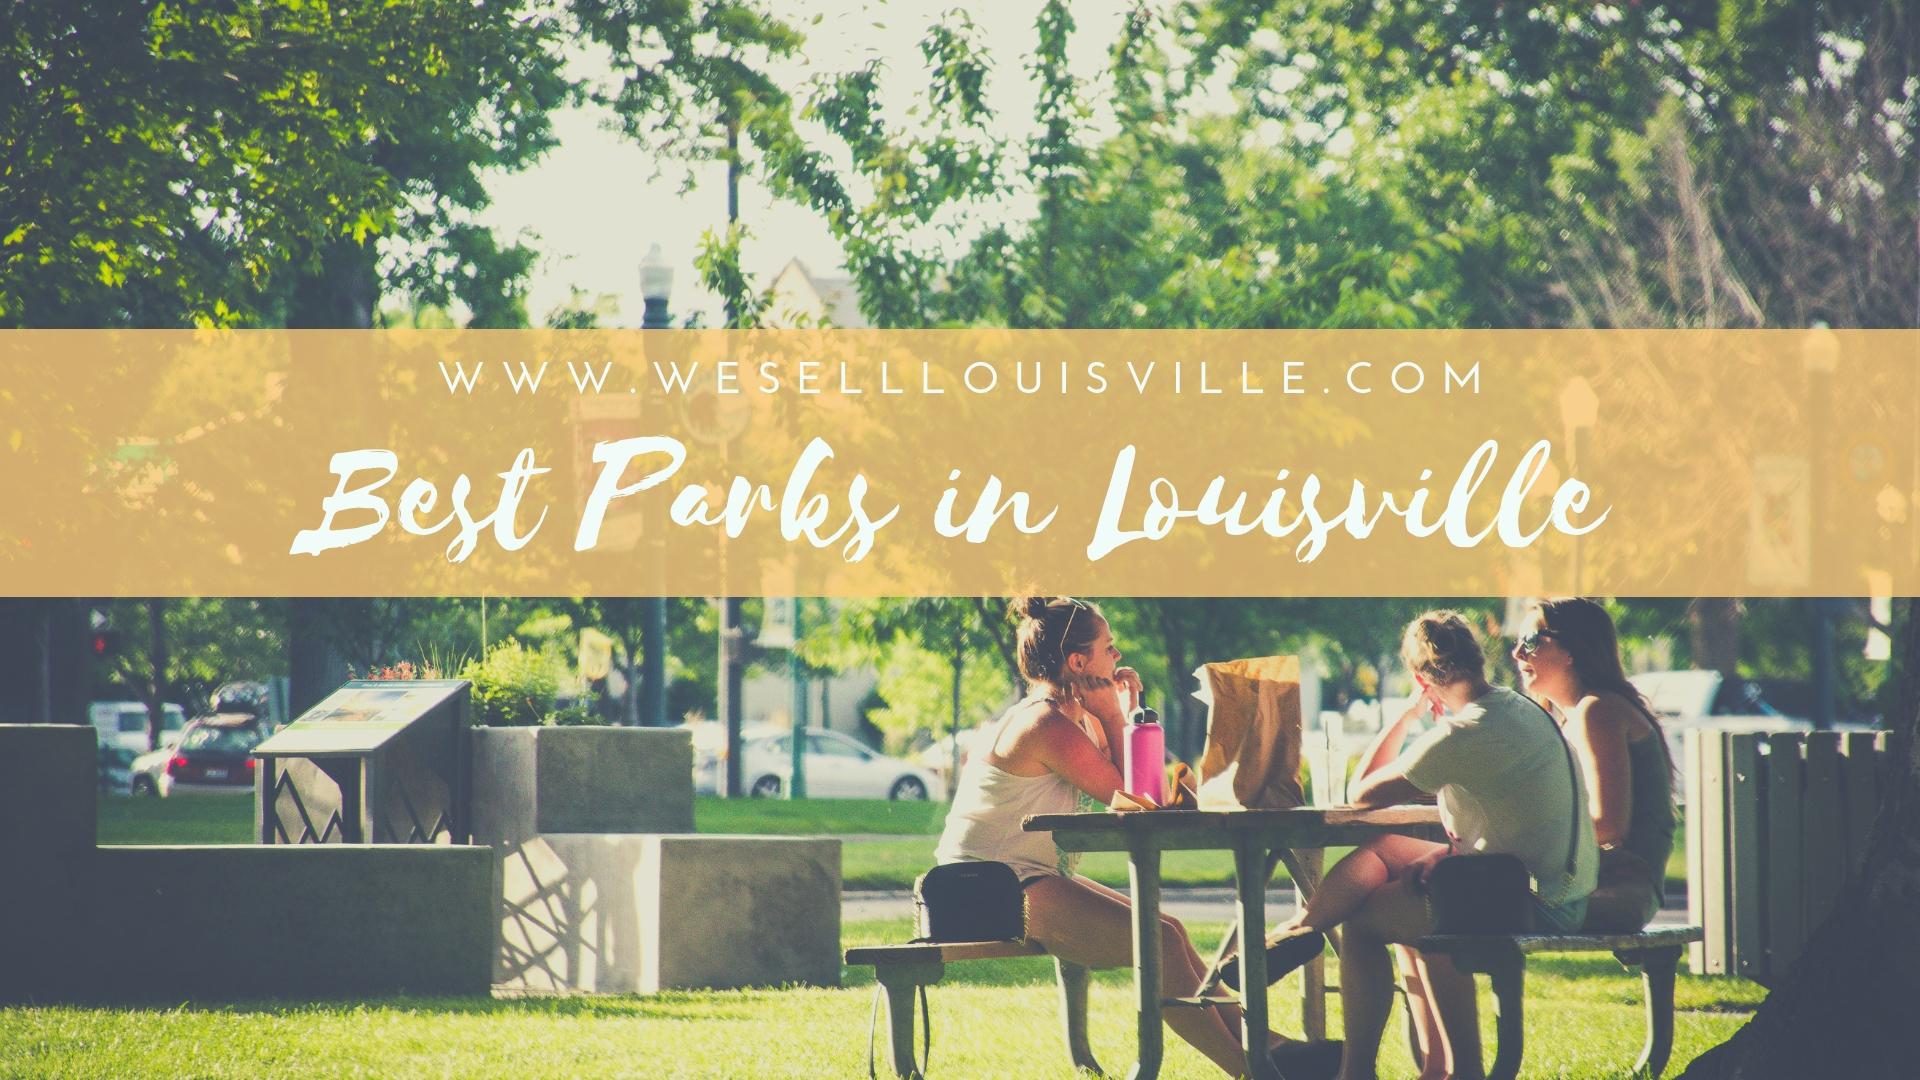 Best Parks in Louisville